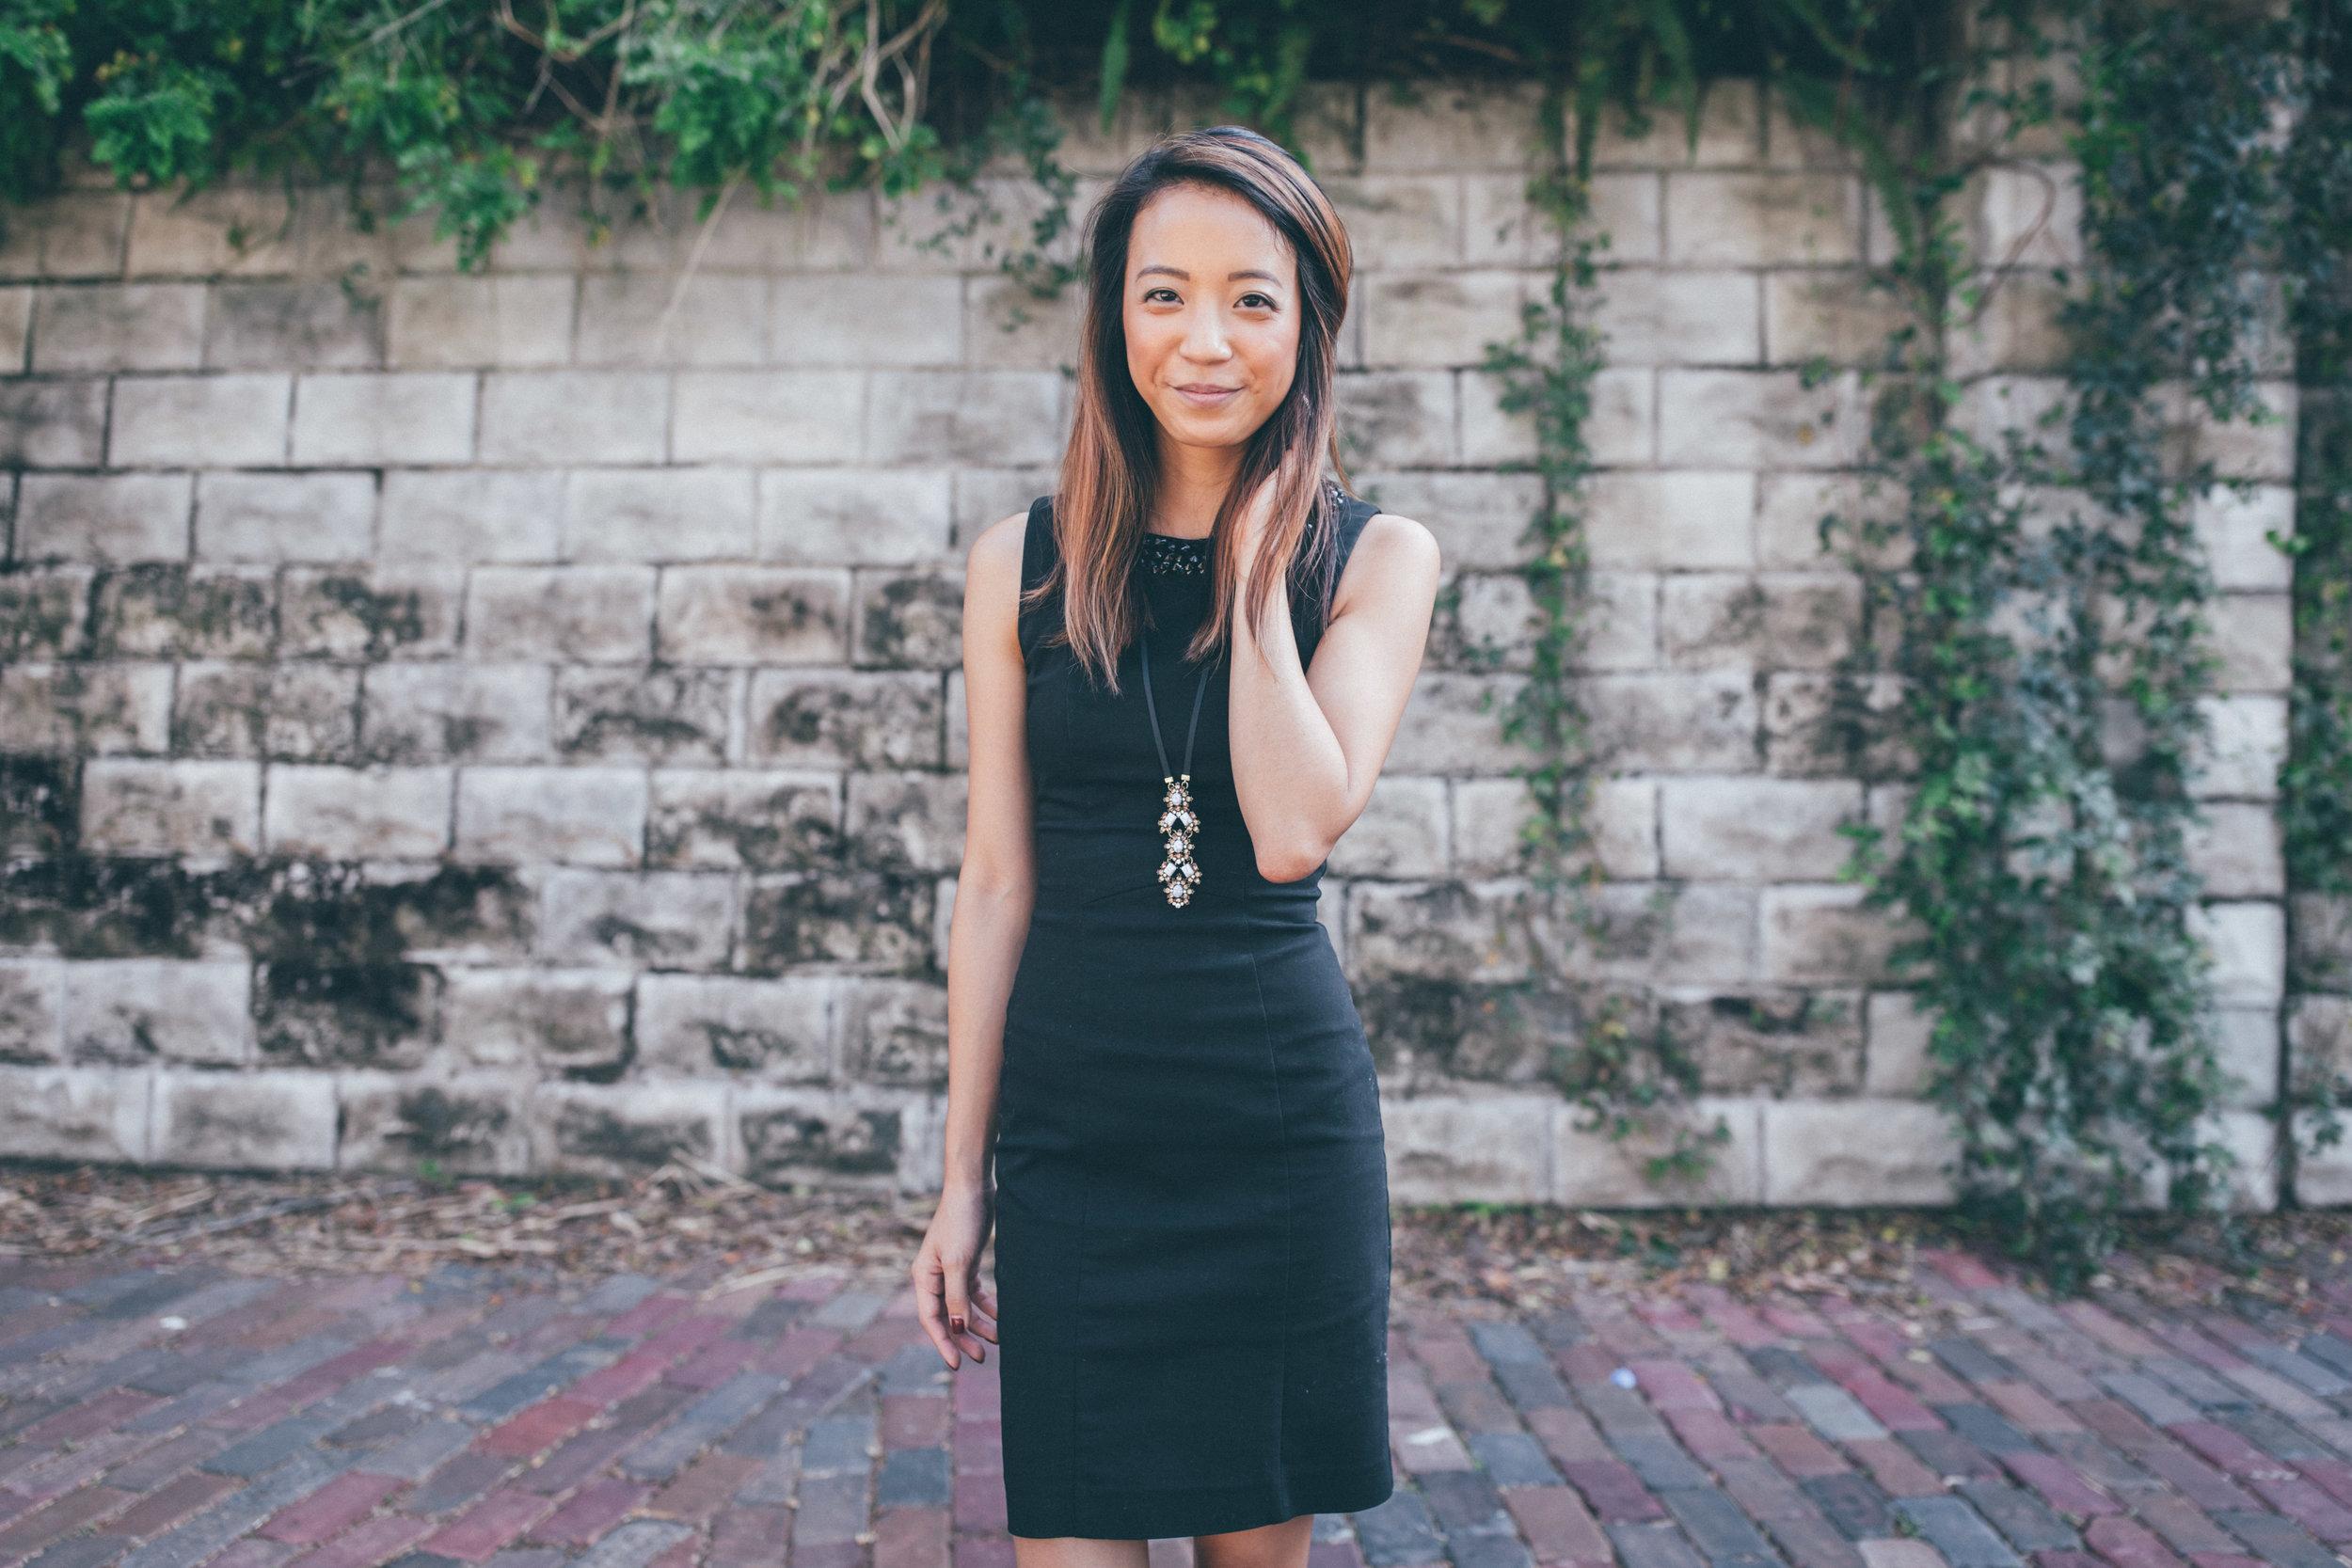 This Jenn Girl - Tampa Blogger - Junior League of St. Pete - Little Black Dress Initiative 2